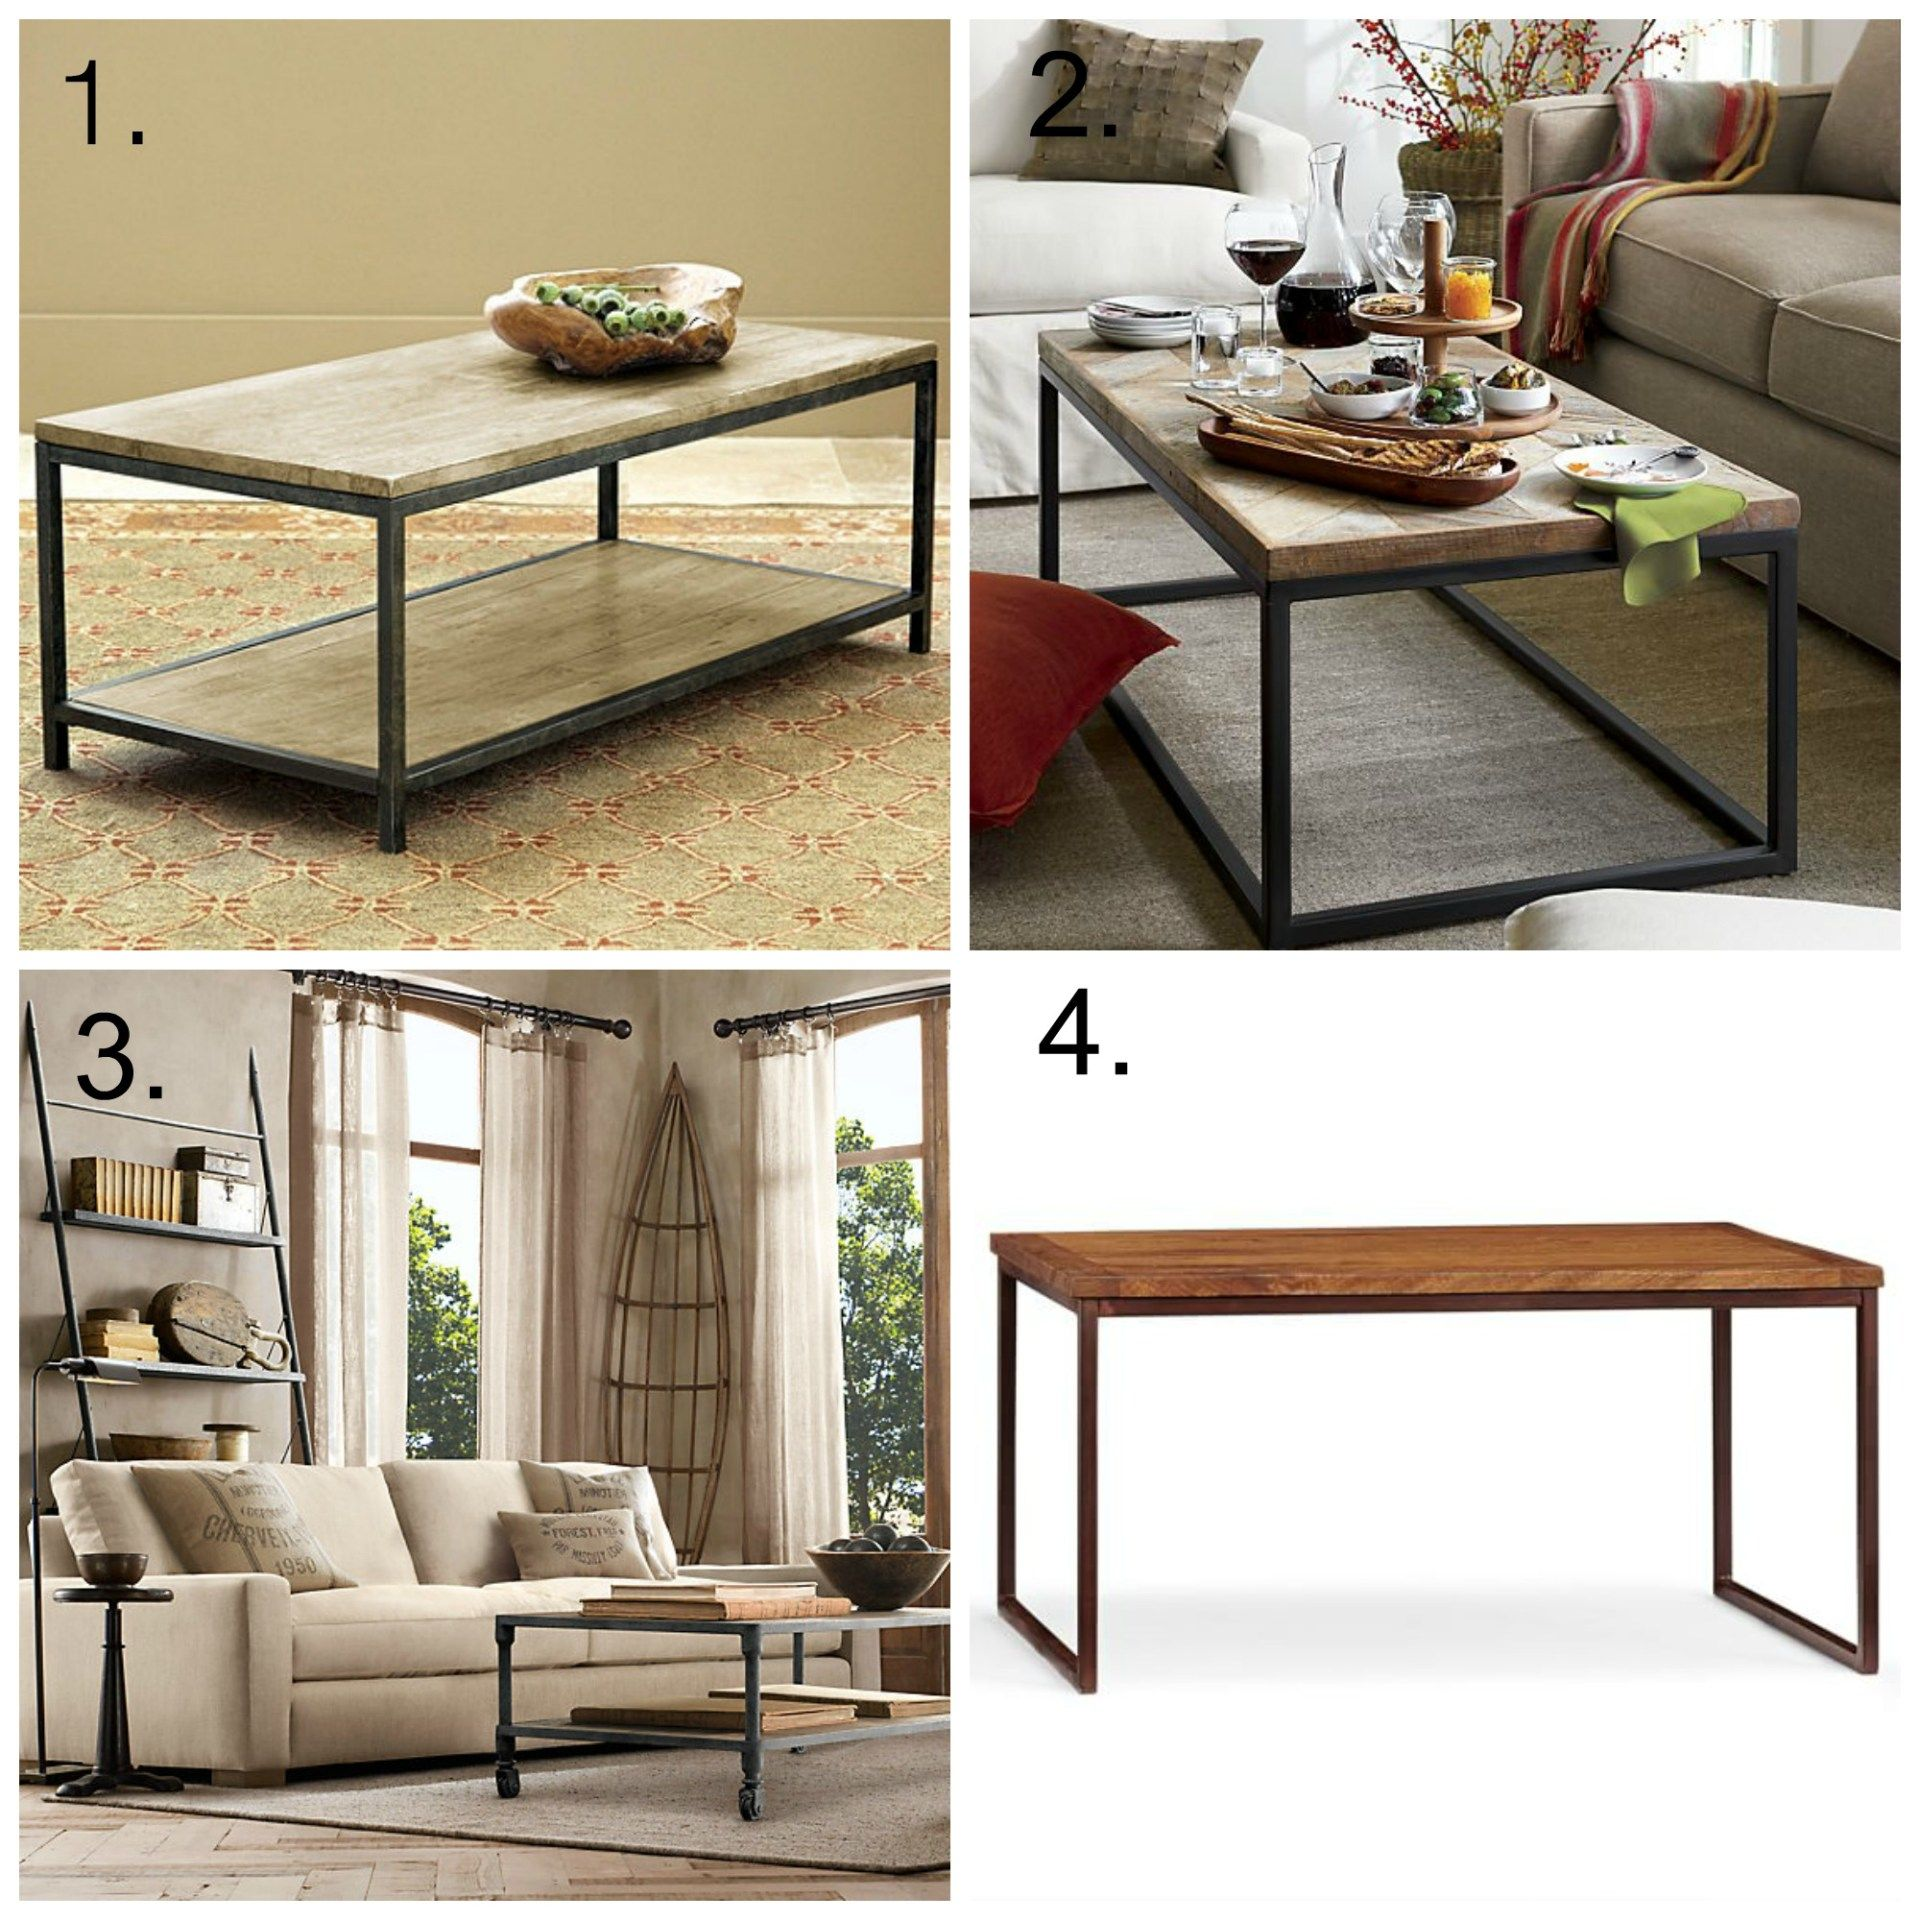 tsd collage ikea vittsj tisch anders pinterest ikea ikea hack und diy. Black Bedroom Furniture Sets. Home Design Ideas